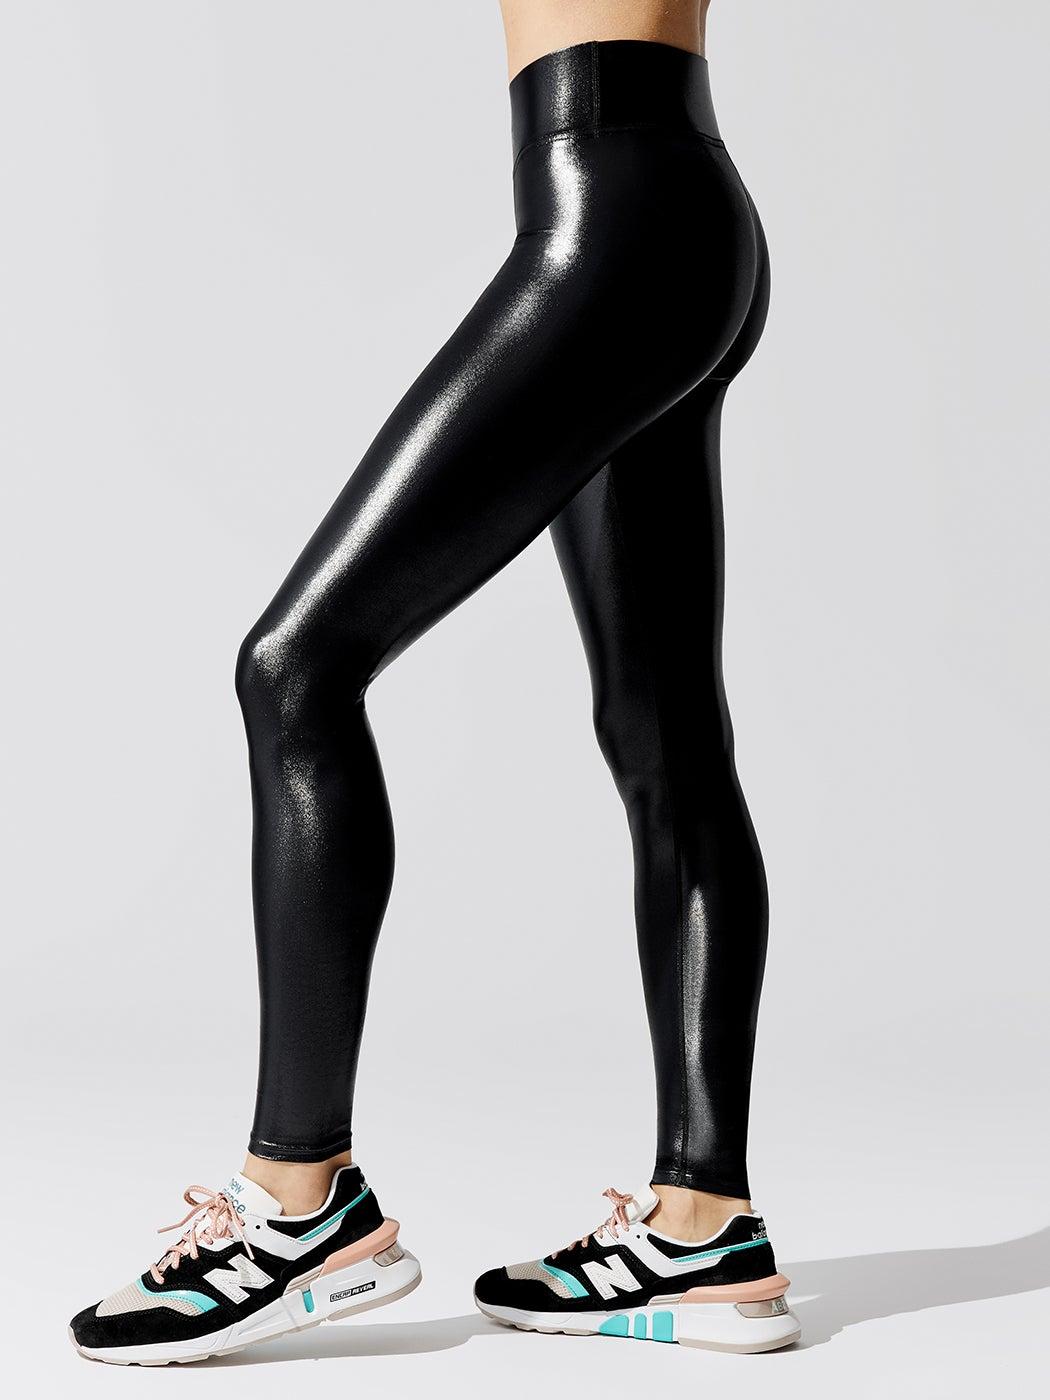 Carbon38 Takara Leggings in Black Medium NWT | Schimiggy